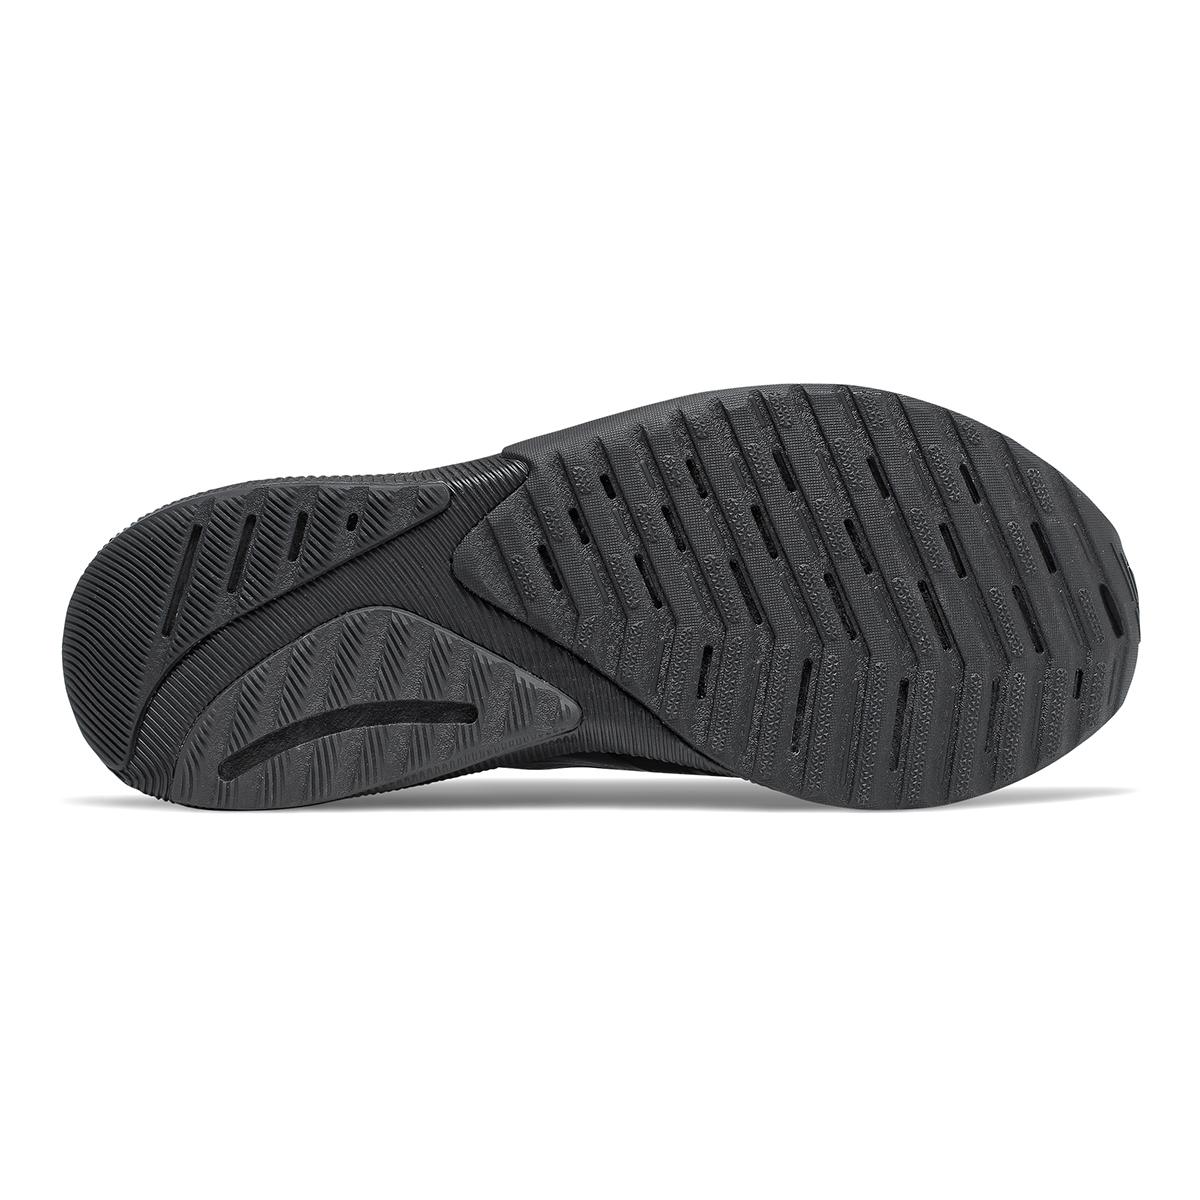 Men's New Balance Fuelcell Propel V2 Running Shoe - Color: Black - Size: 7 - Width: Wide, Black, large, image 4